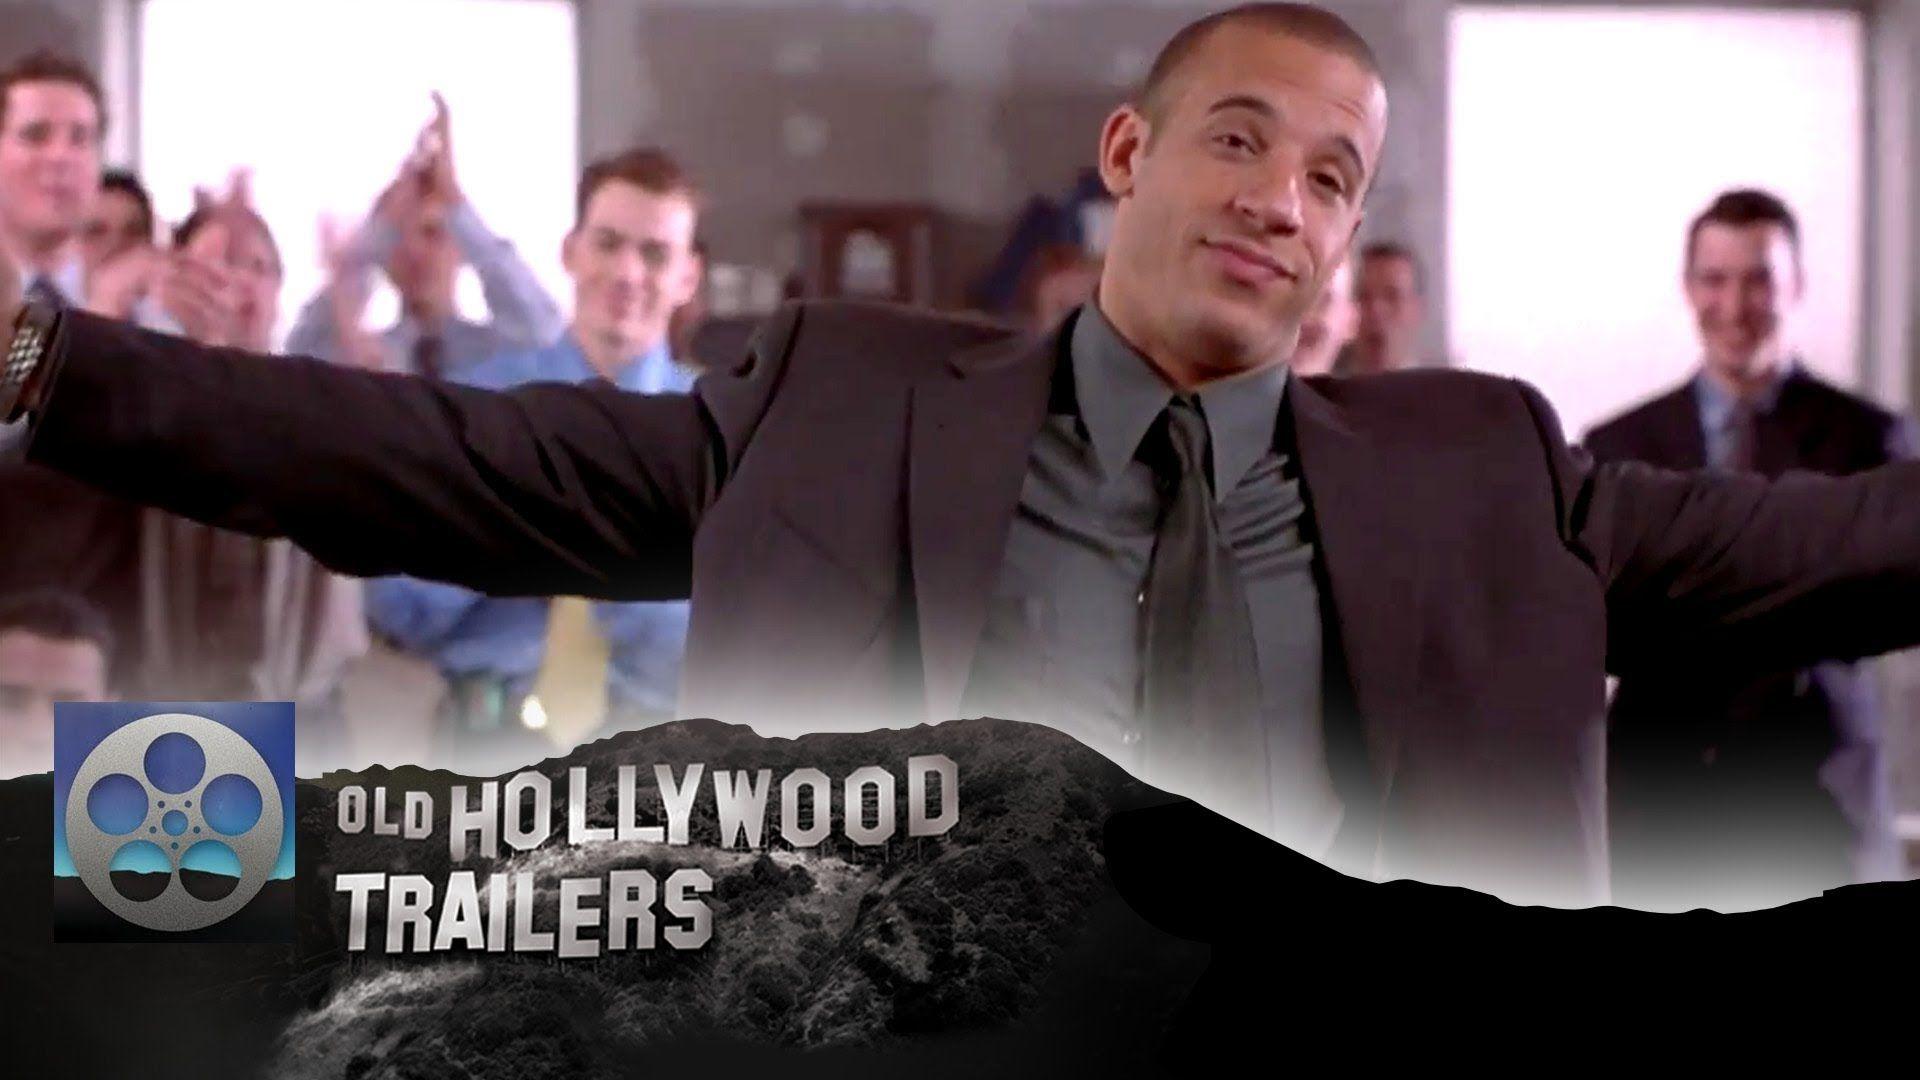 Boiler Room Quotes Boiler Room 2000 Official Trailer 1  Vin Diesel Movie Hd